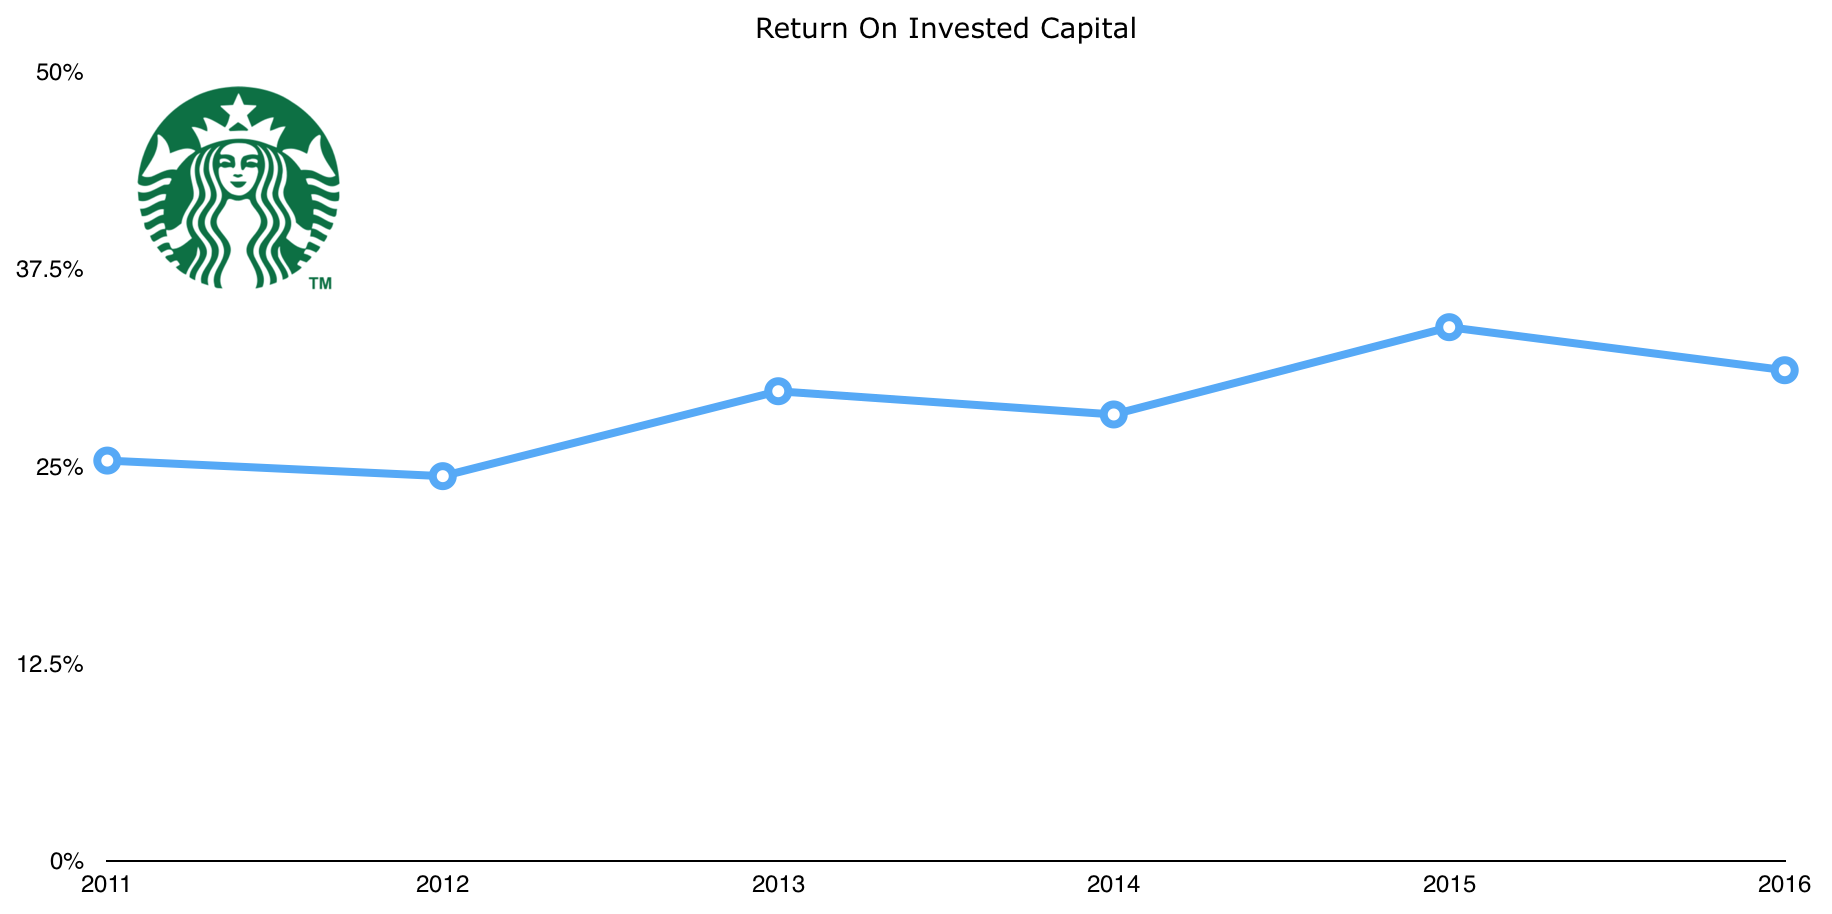 starbucks_return_on_invested_capital